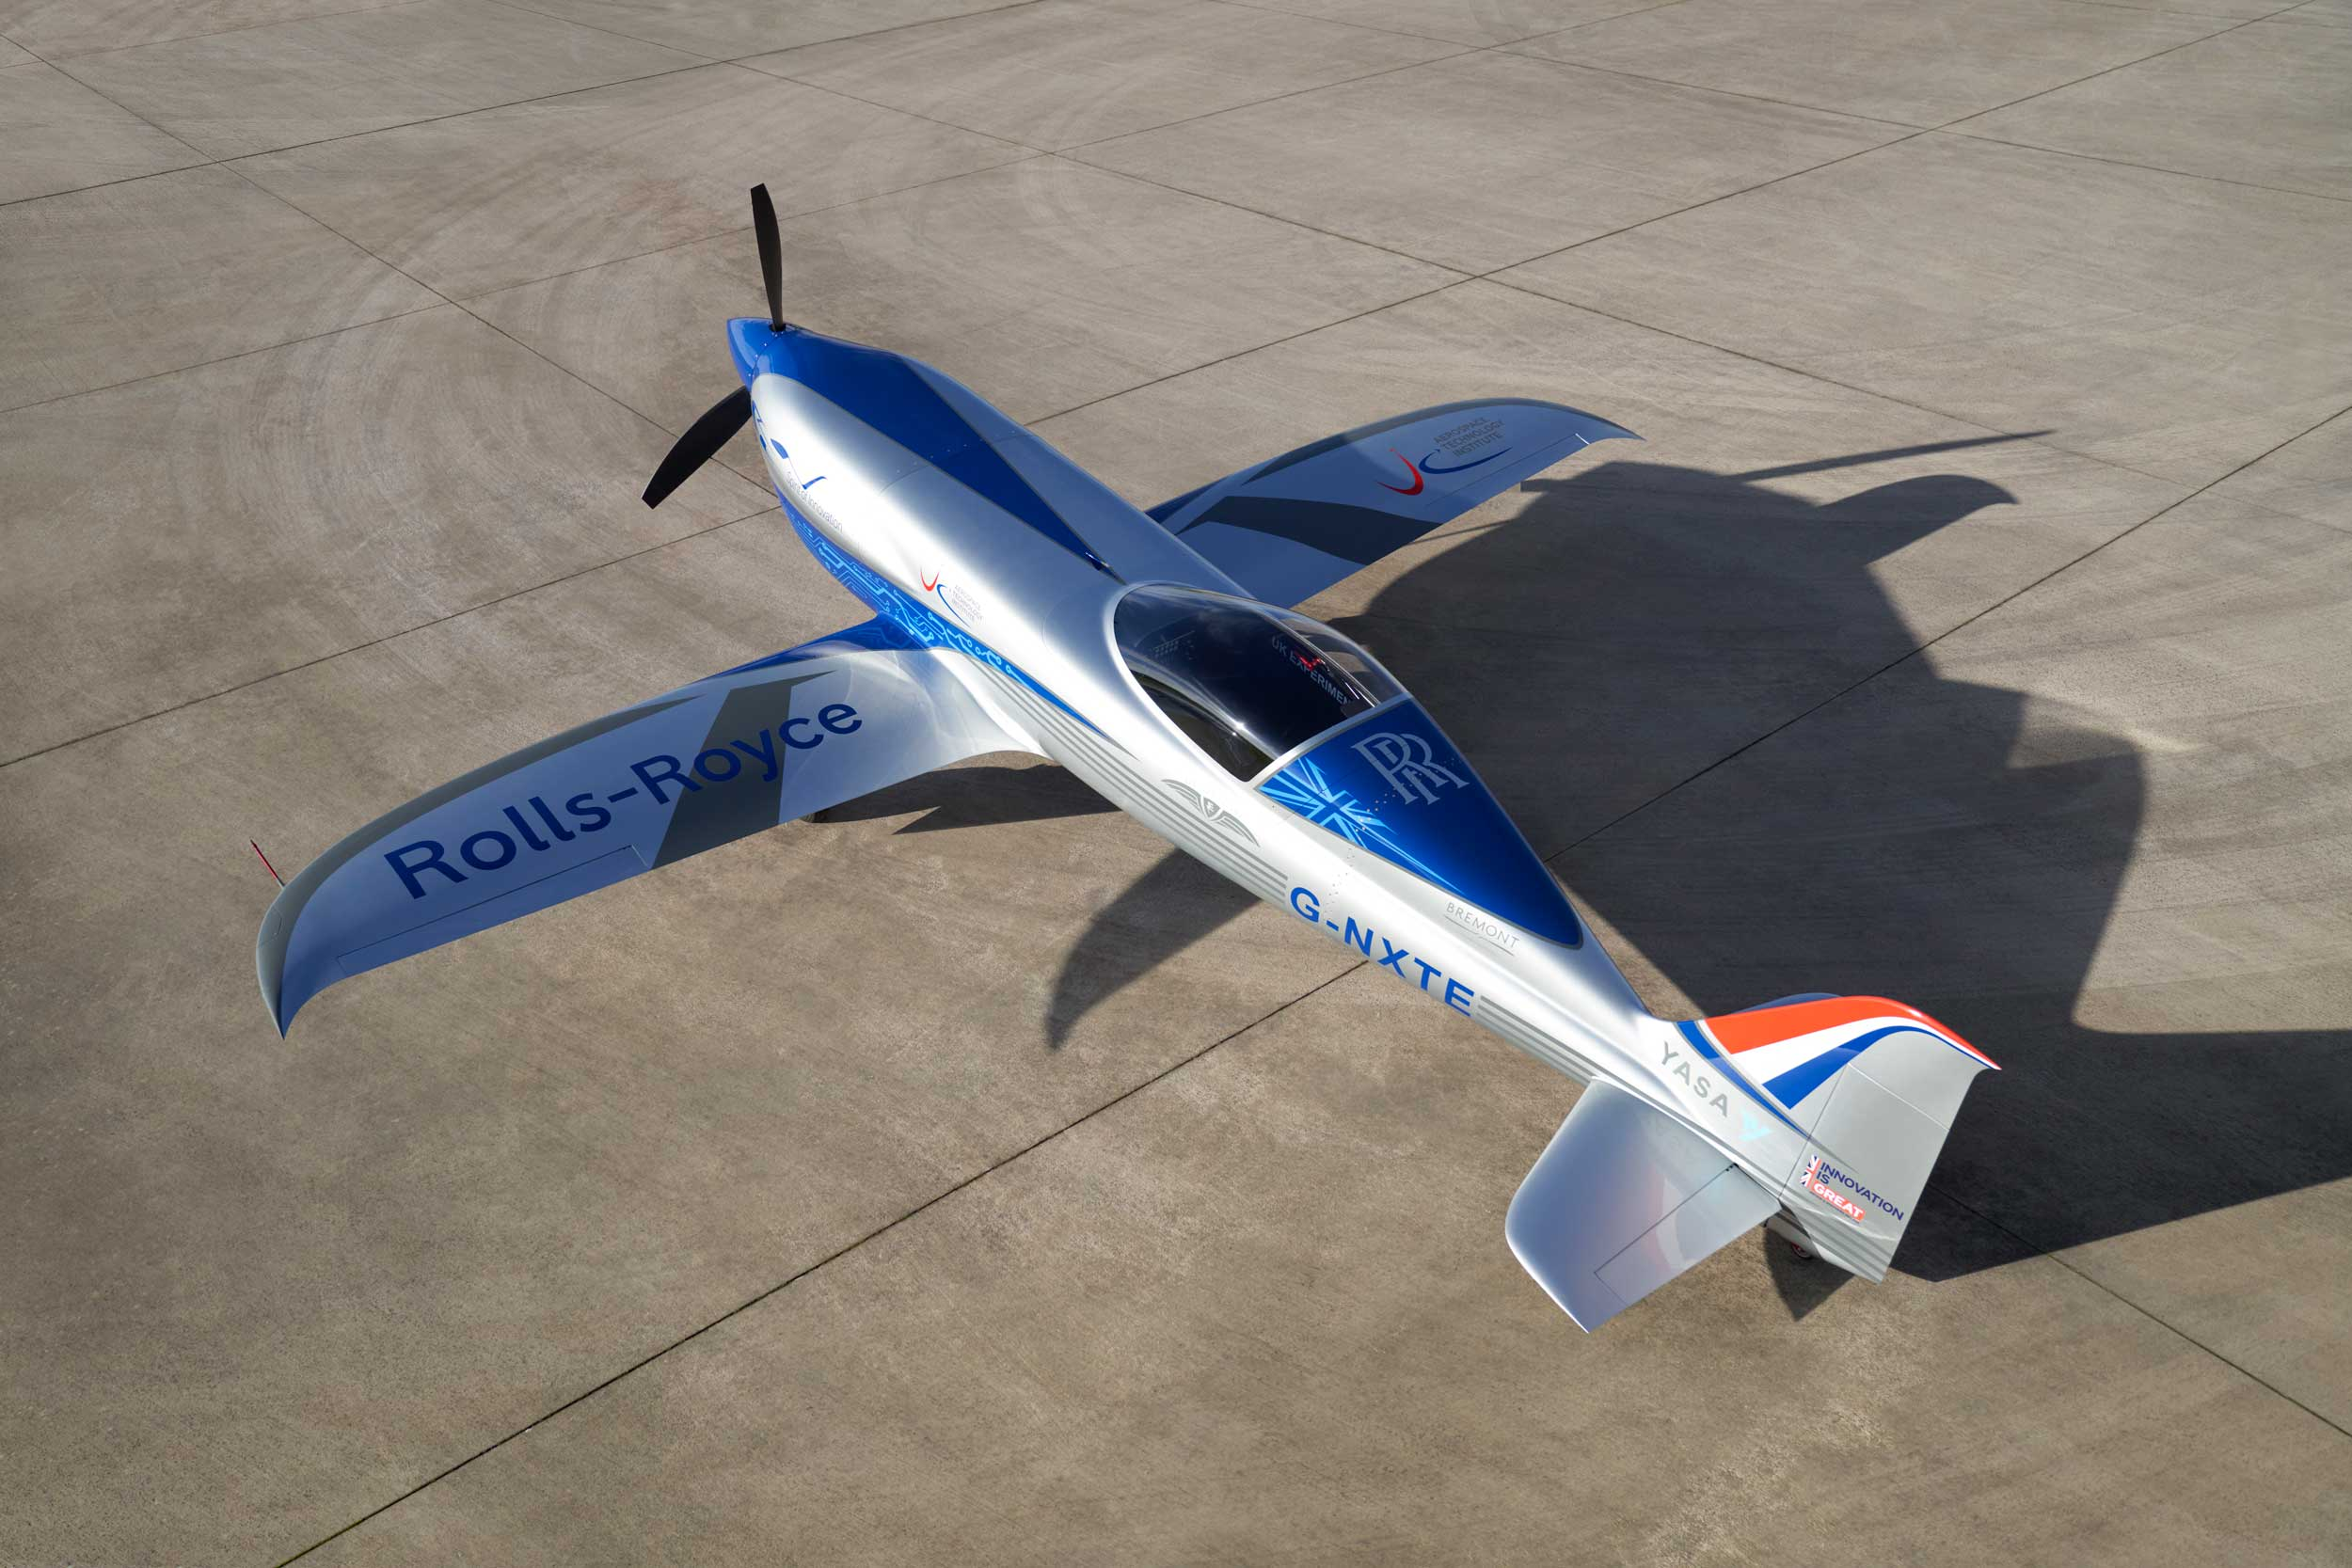 Rolls-Royce electric aircraft